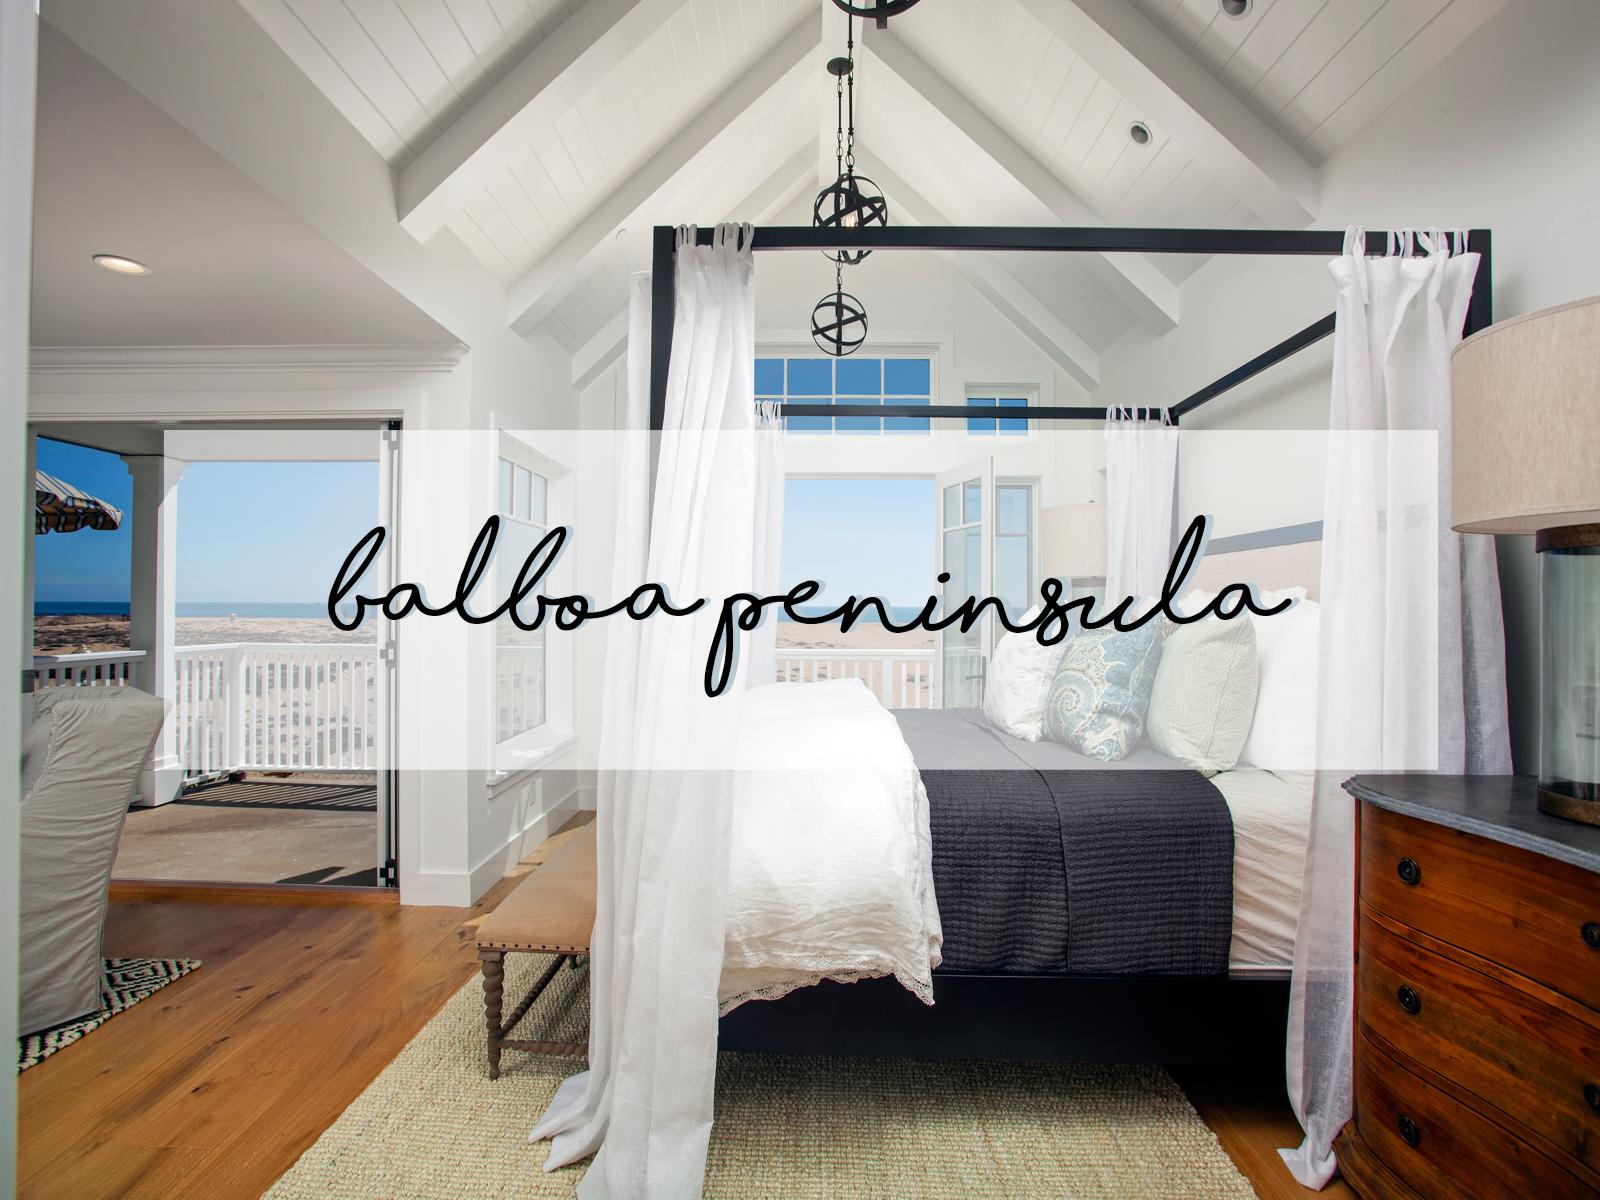 blackband_design_balboa_peninsula-1